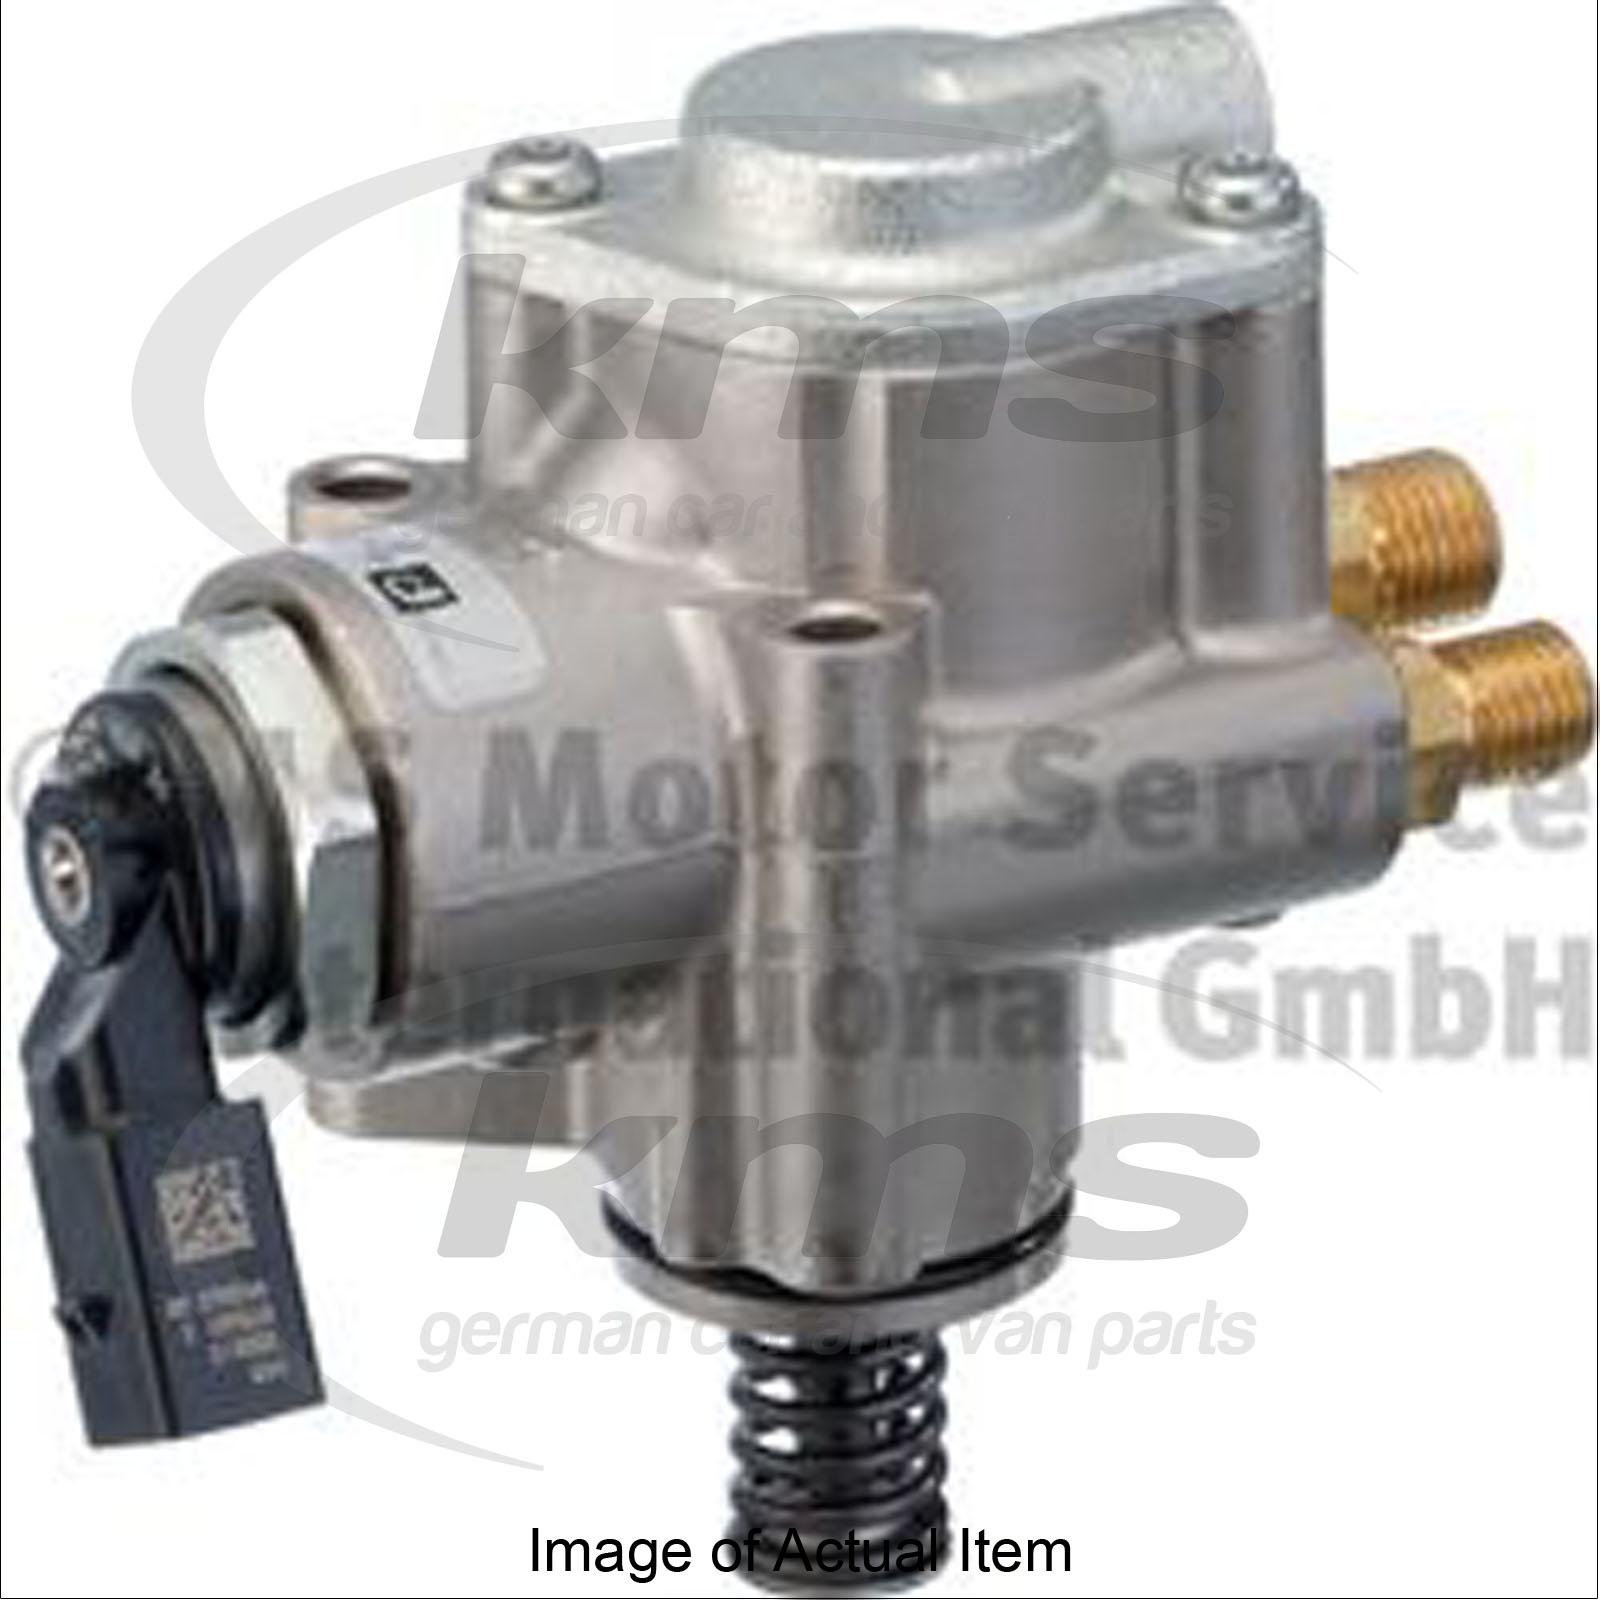 High Pressure Fuel Pump AUDI A4 (8EC, B7) 3.2 FSI Quattro